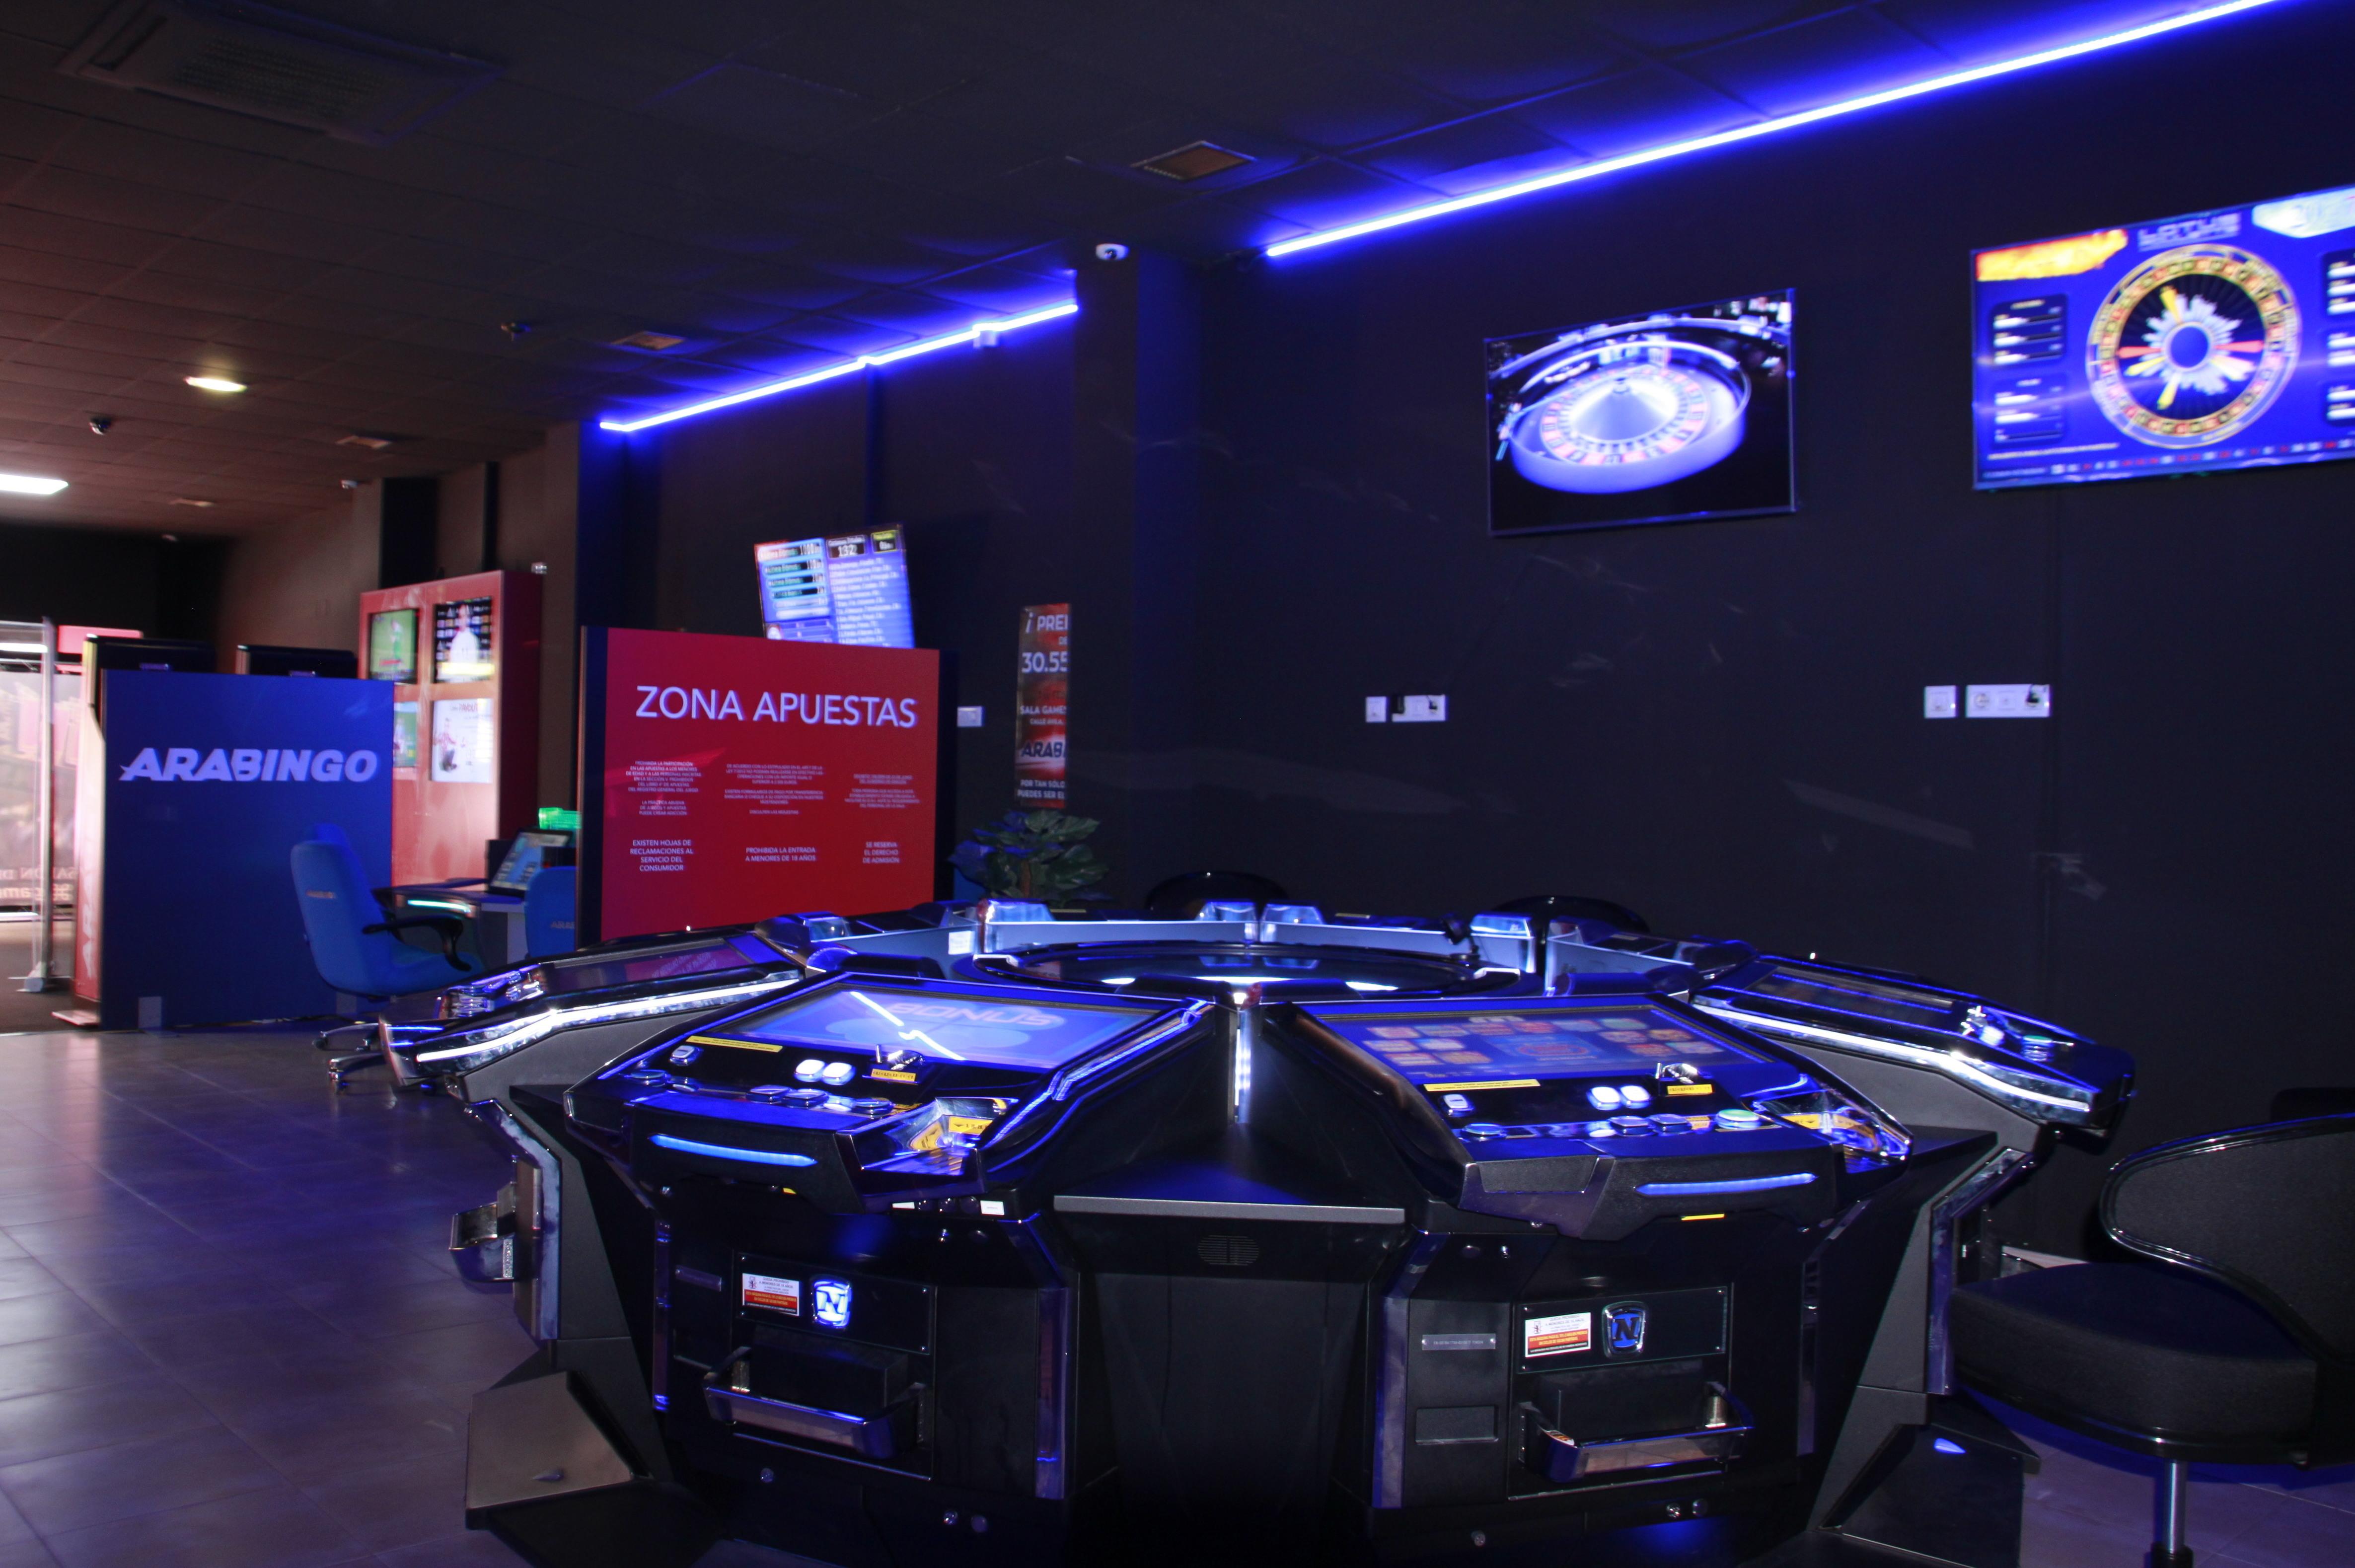 Salones recreativos Zaragoza